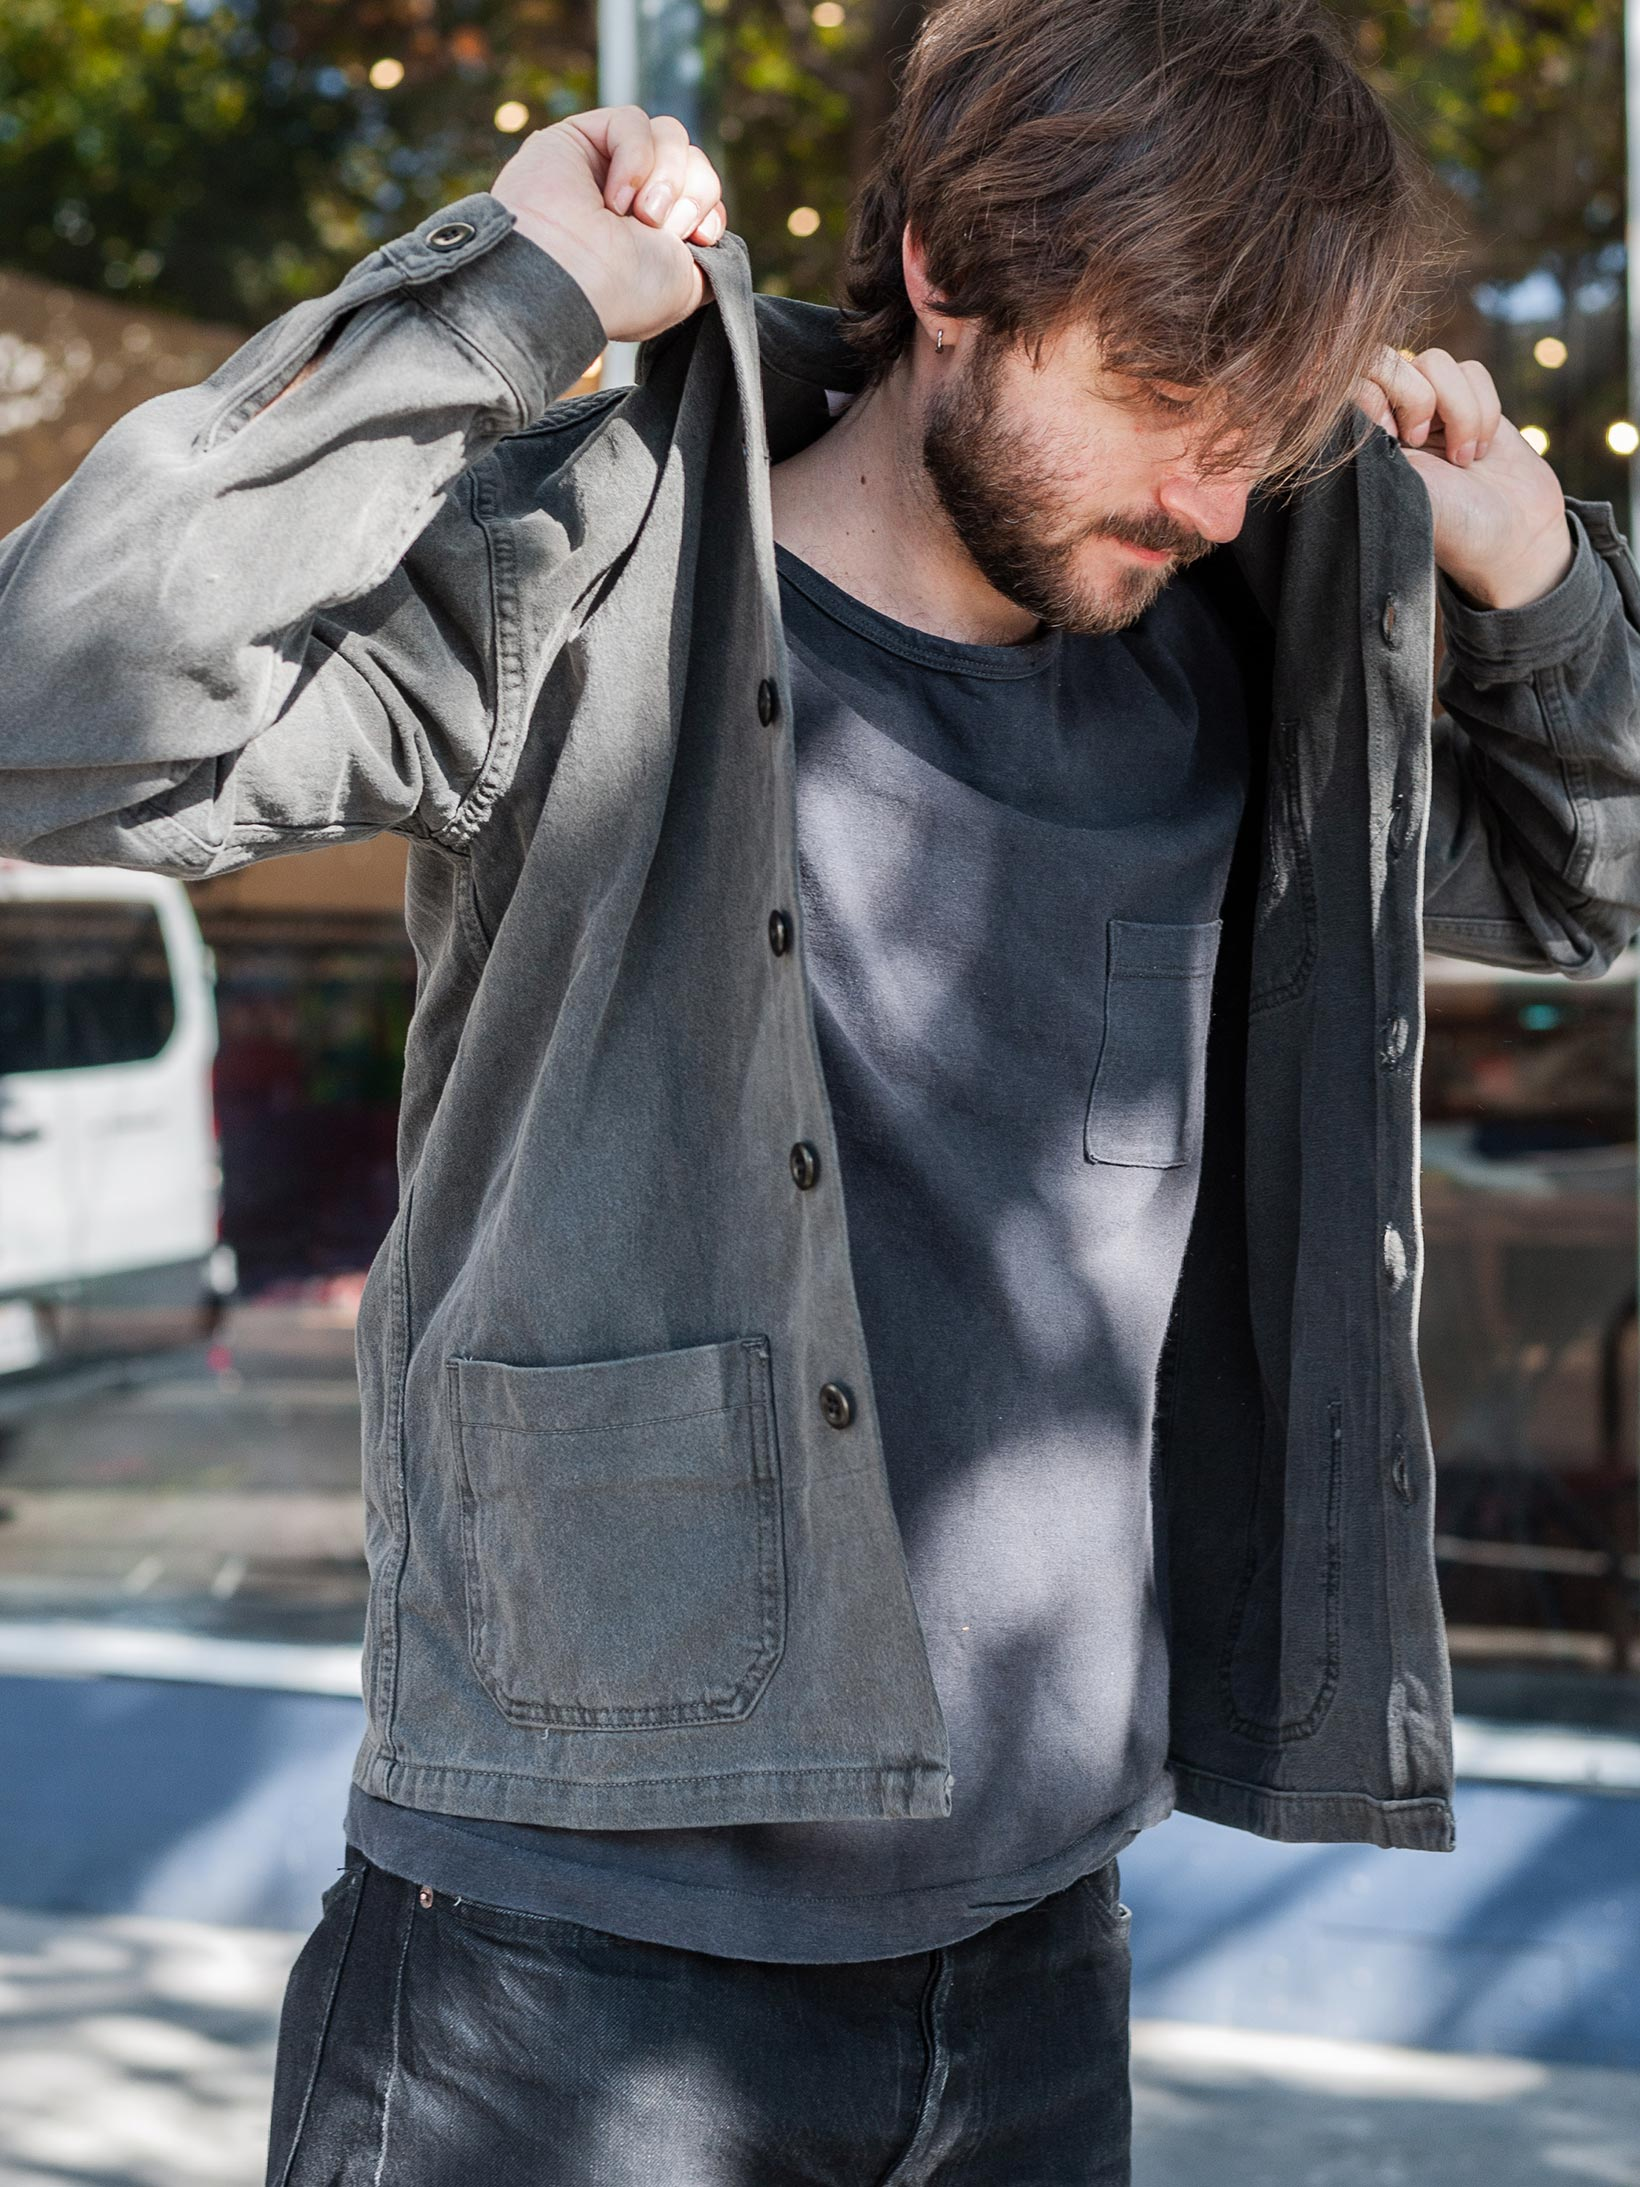 3sixteen Garment Dyed Shop Jacket - Smoke - Image 26